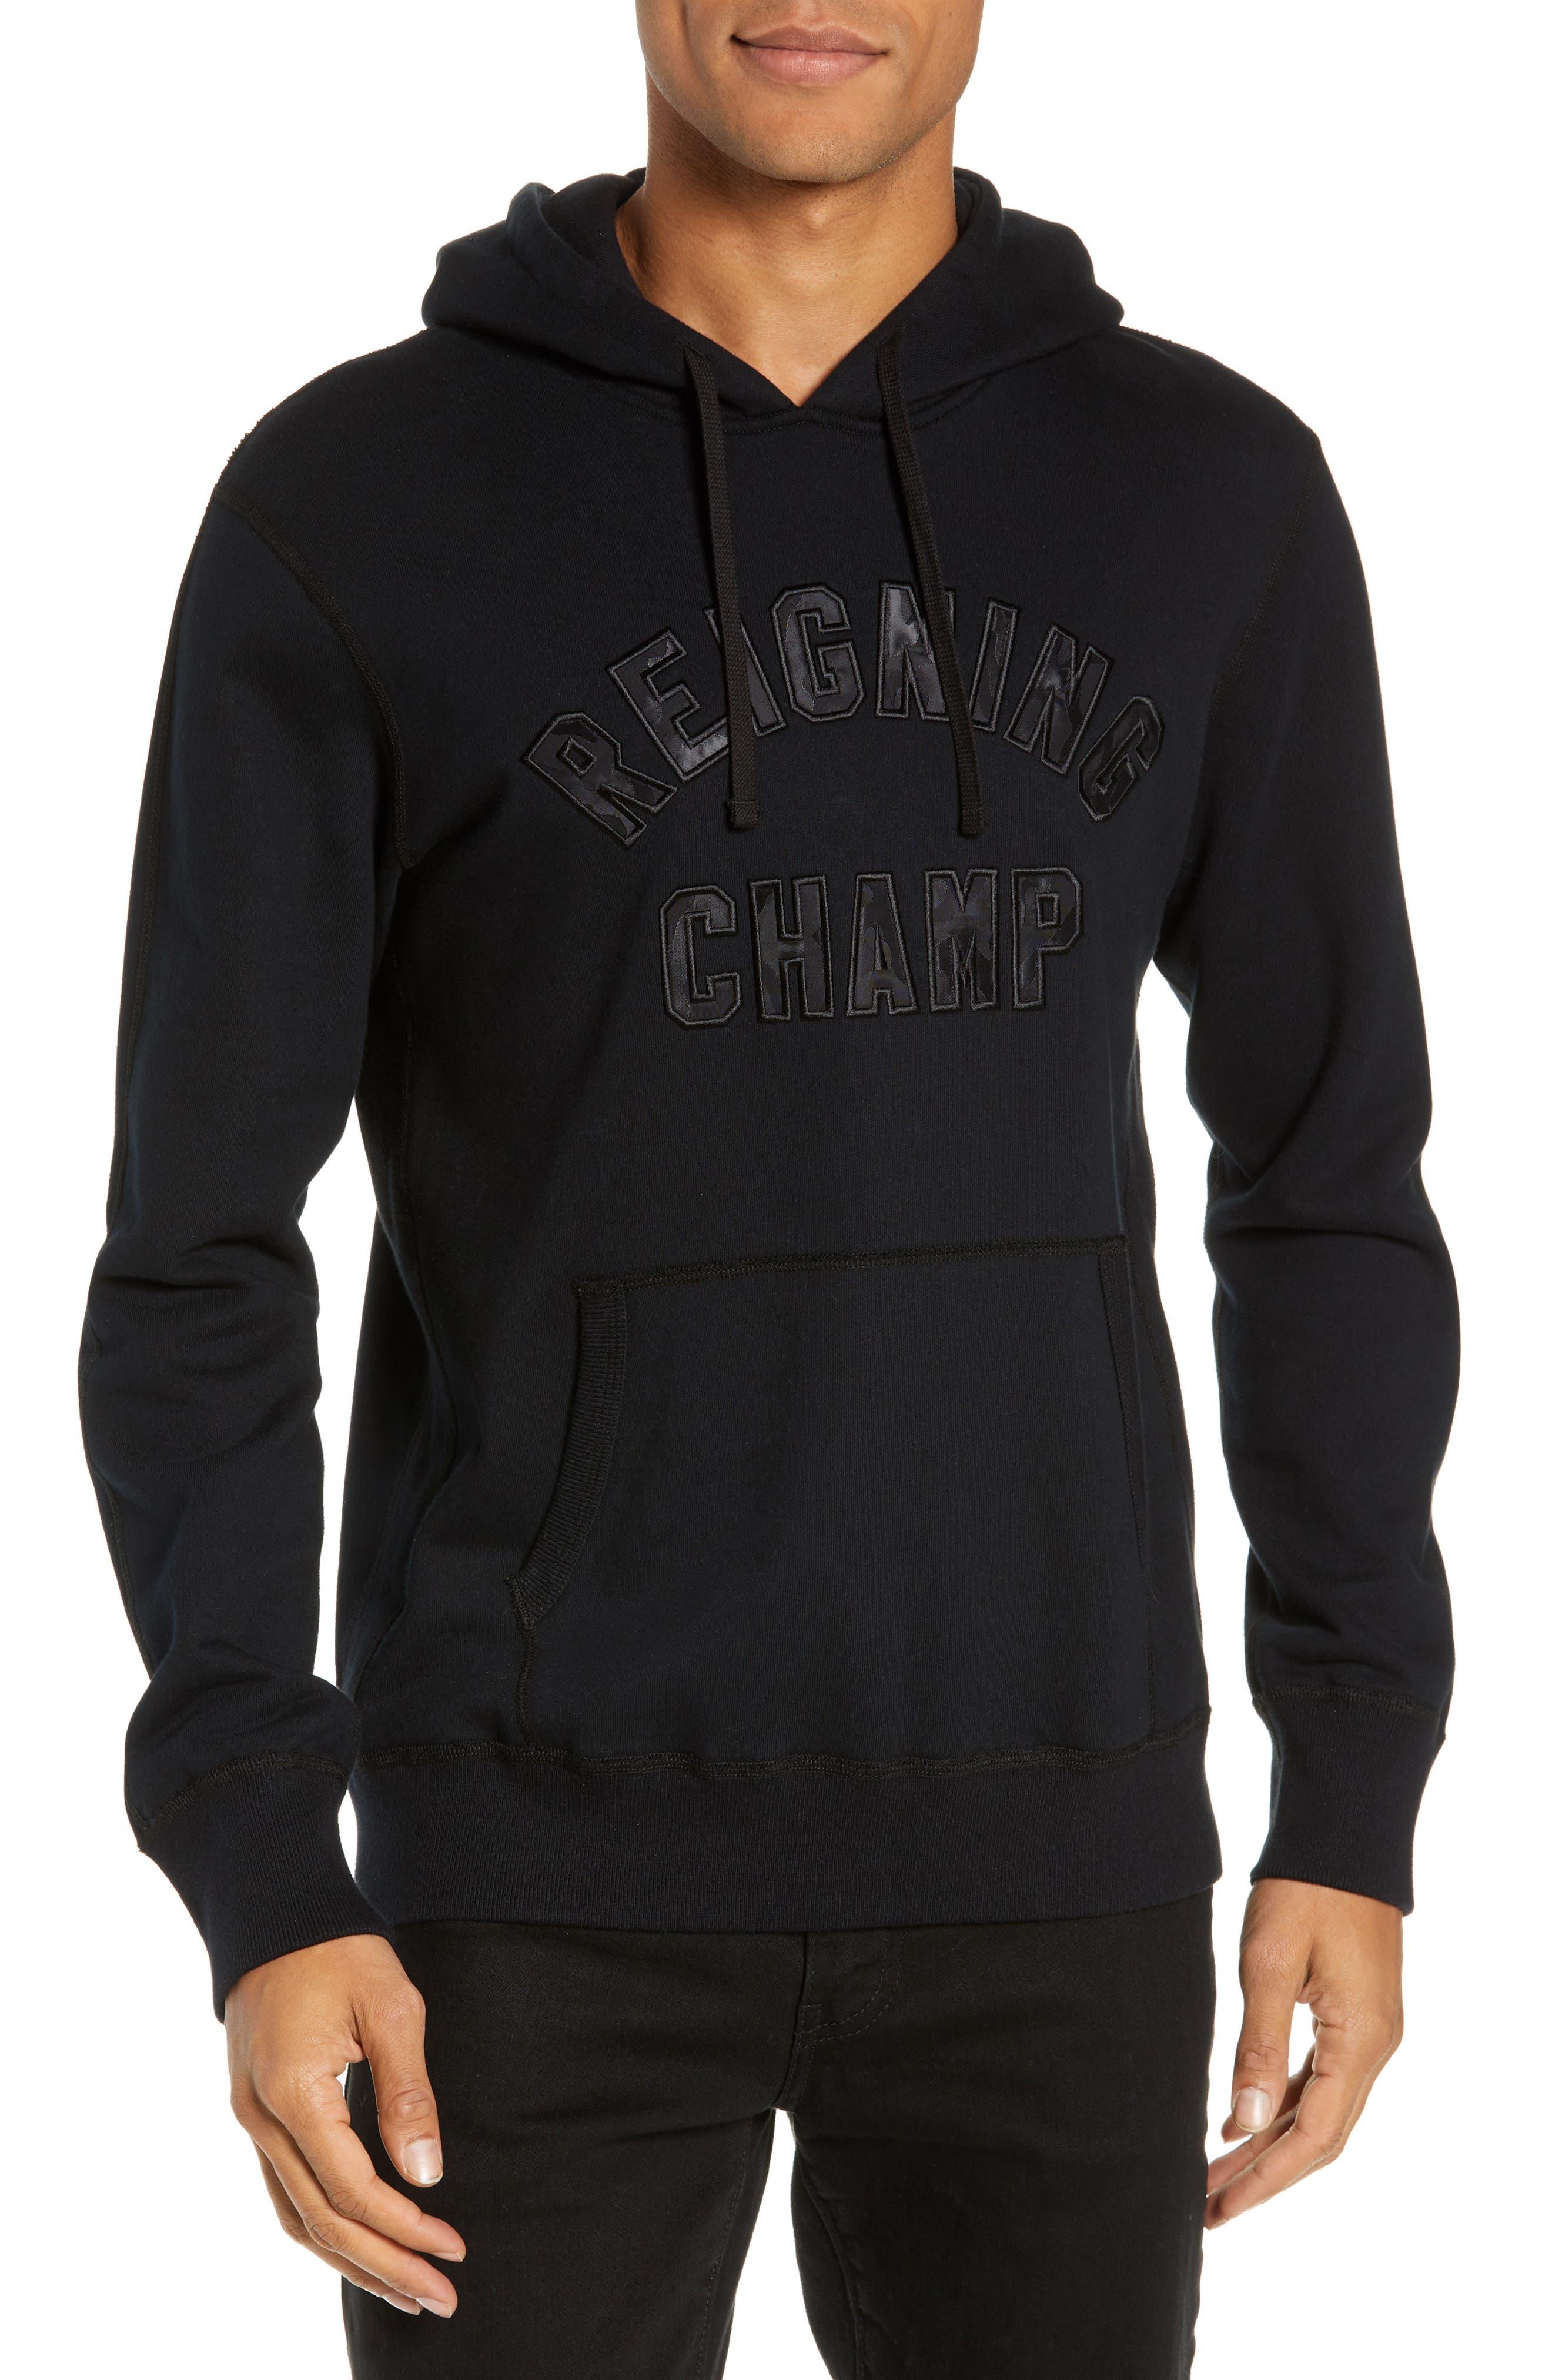 REIGNING CHAMP, Club Logo Hooded Sweatshirt, Main thumbnail 1, color, BLACK